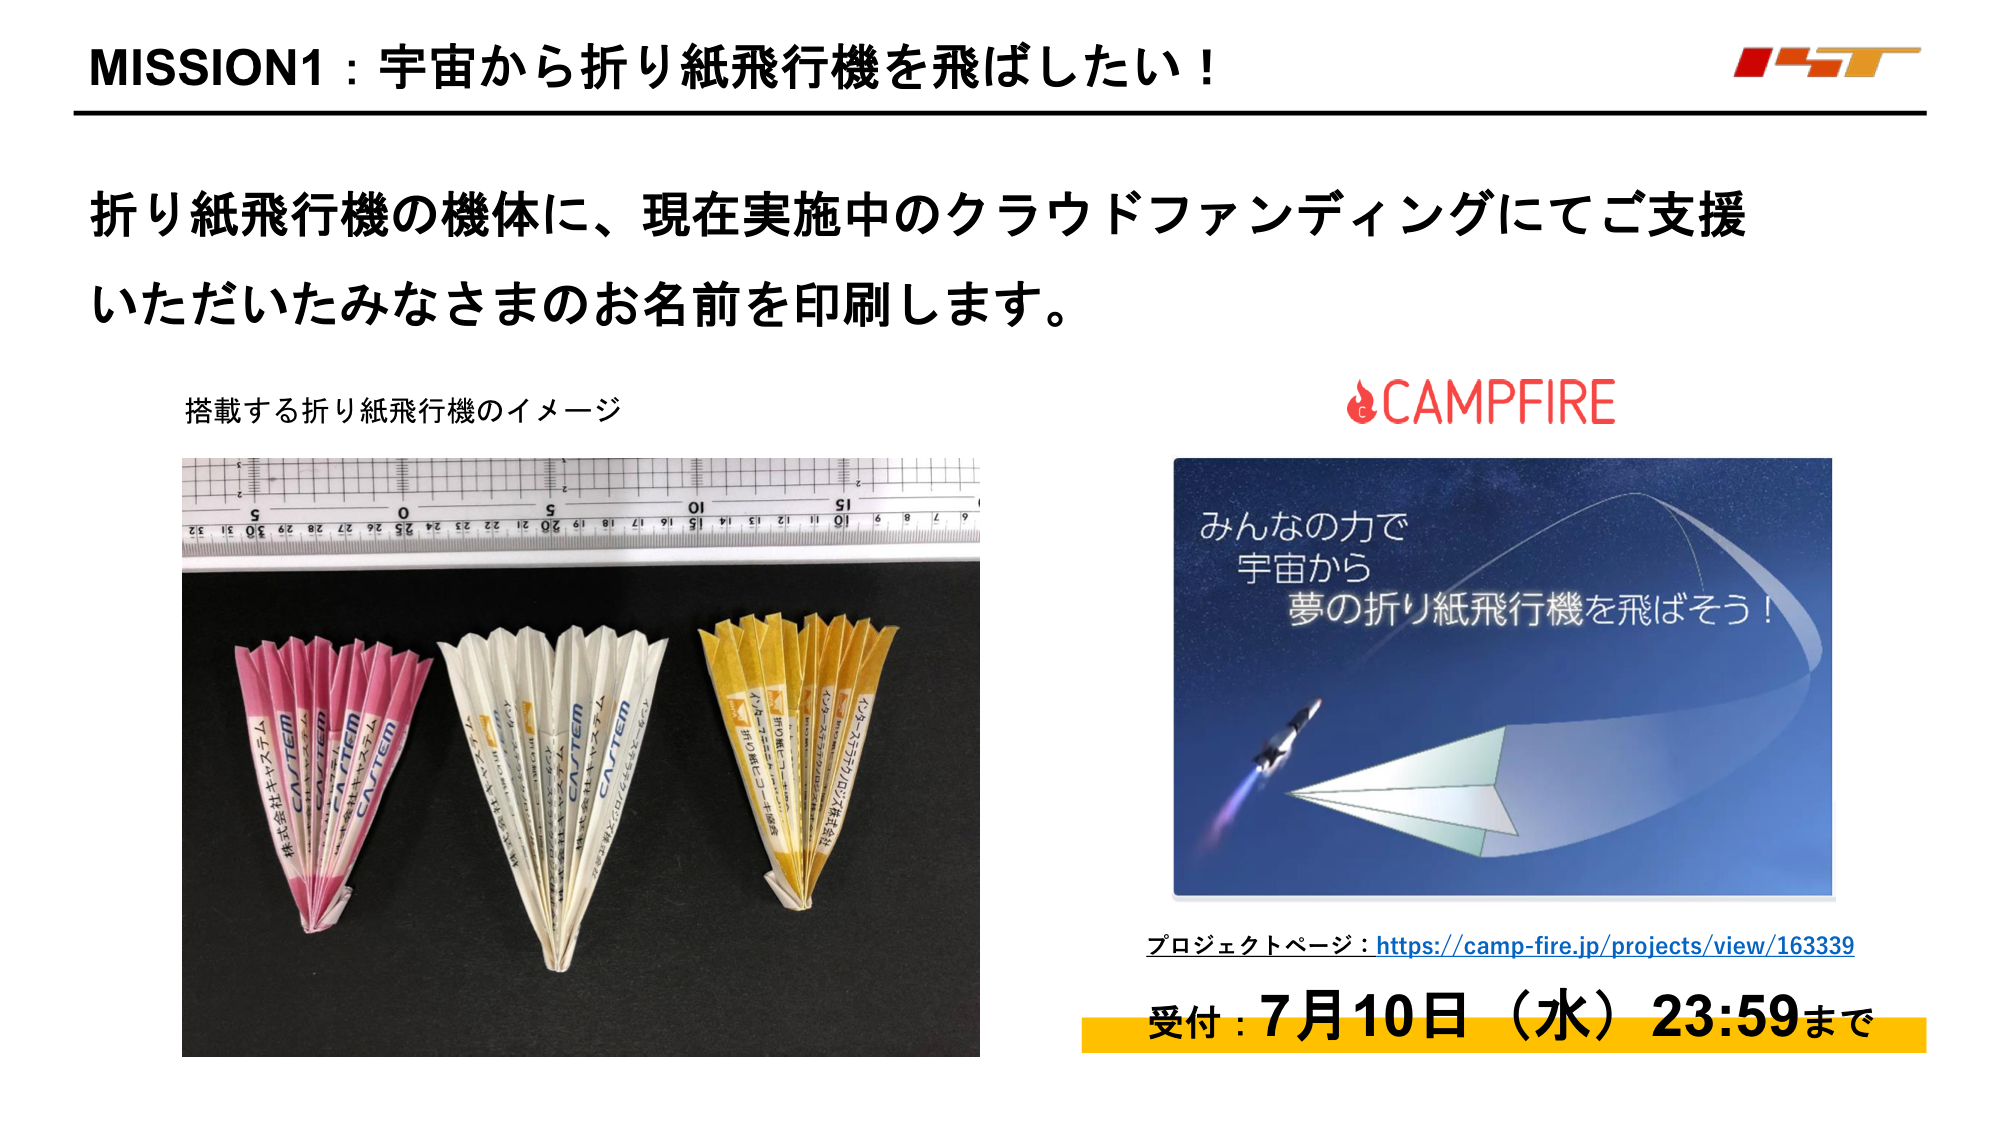 f:id:Imamura:20190628161215p:plain